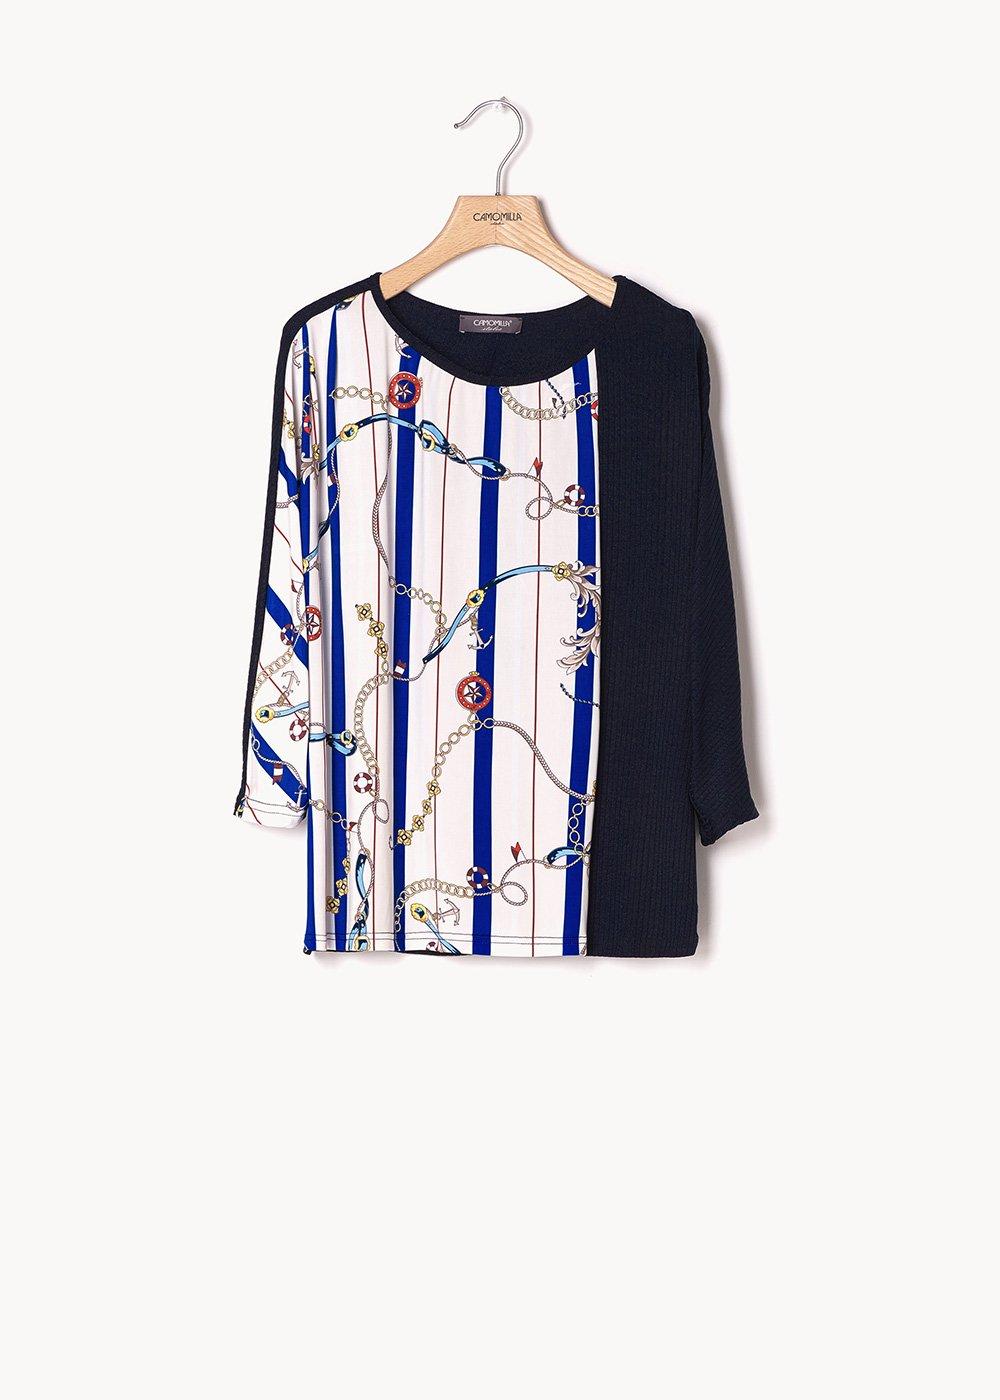 Silvana plain t-shirt with chain pattern - White / Marina Stripes - Woman